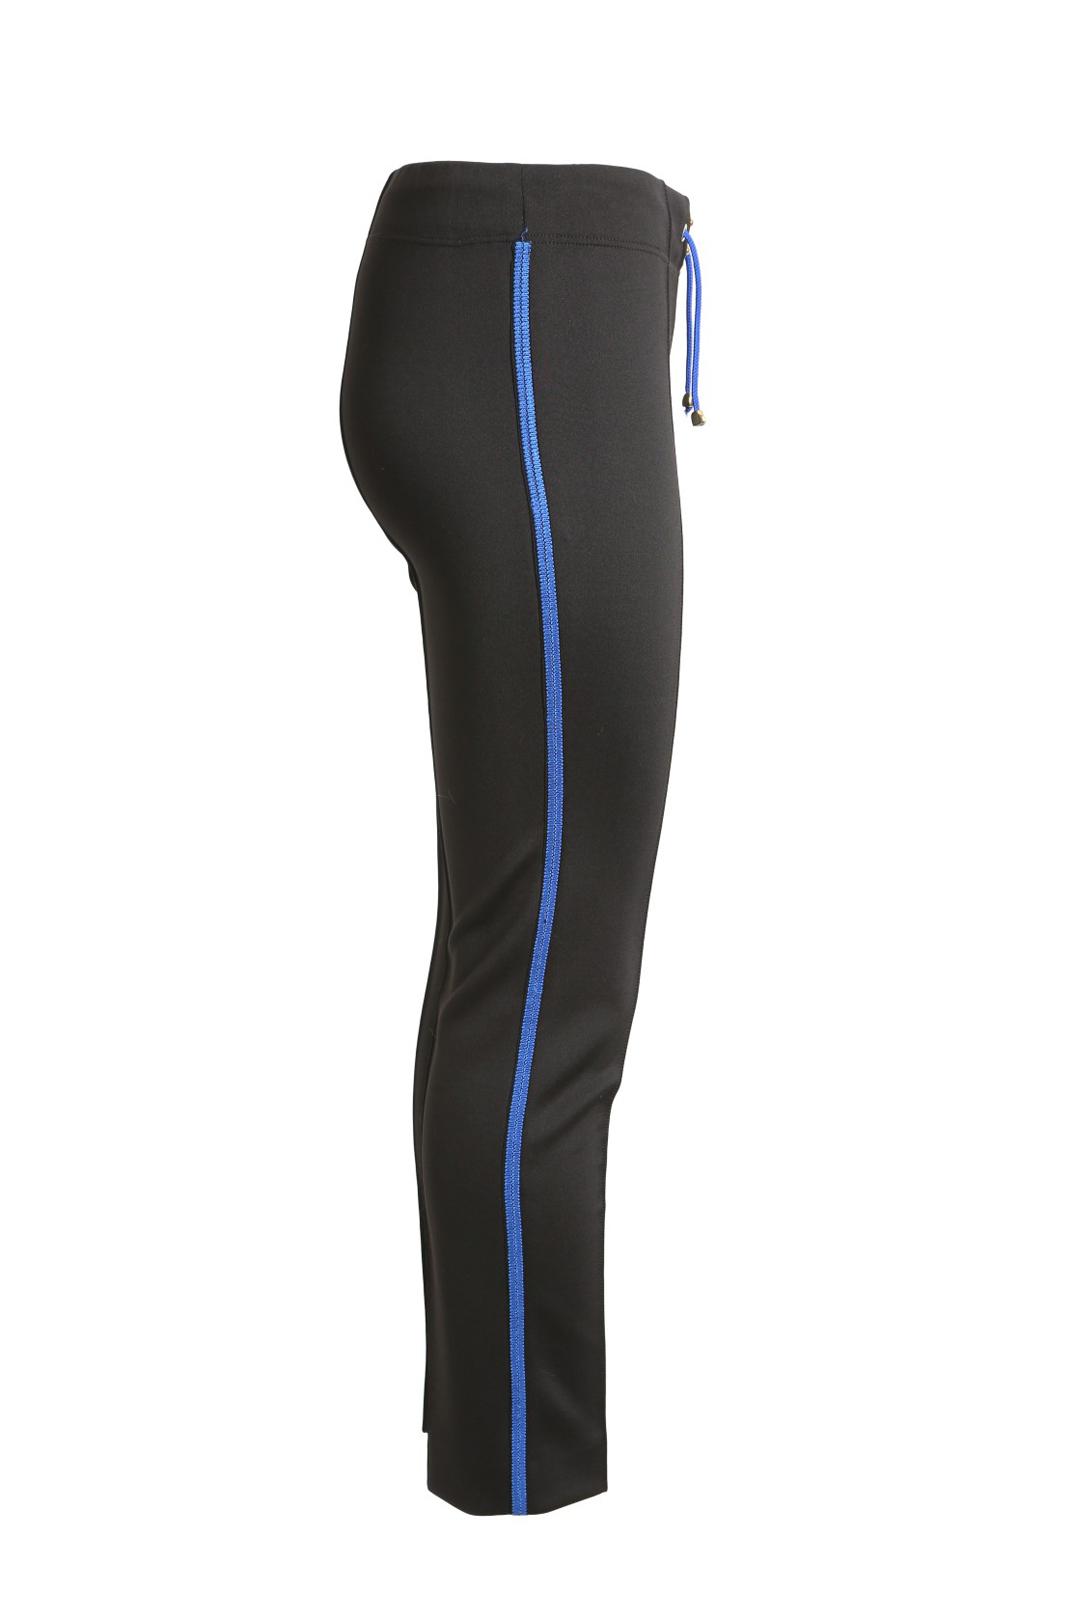 Classic logo pants, black-royal blue